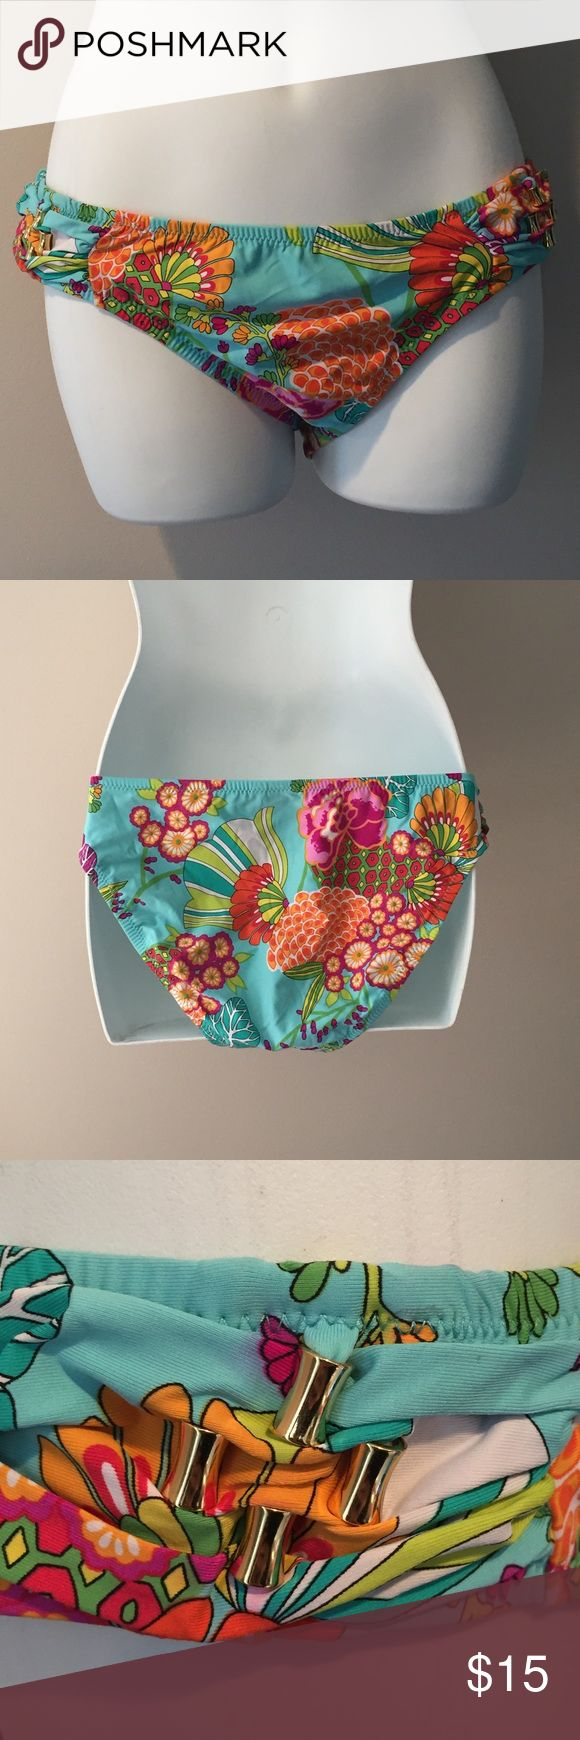 Trina Turk blue floral bikini bottoms. Size 10 Like new Trina Turk blue floral bikini bottoms. Size 10 Trina Turk Swim Bikinis